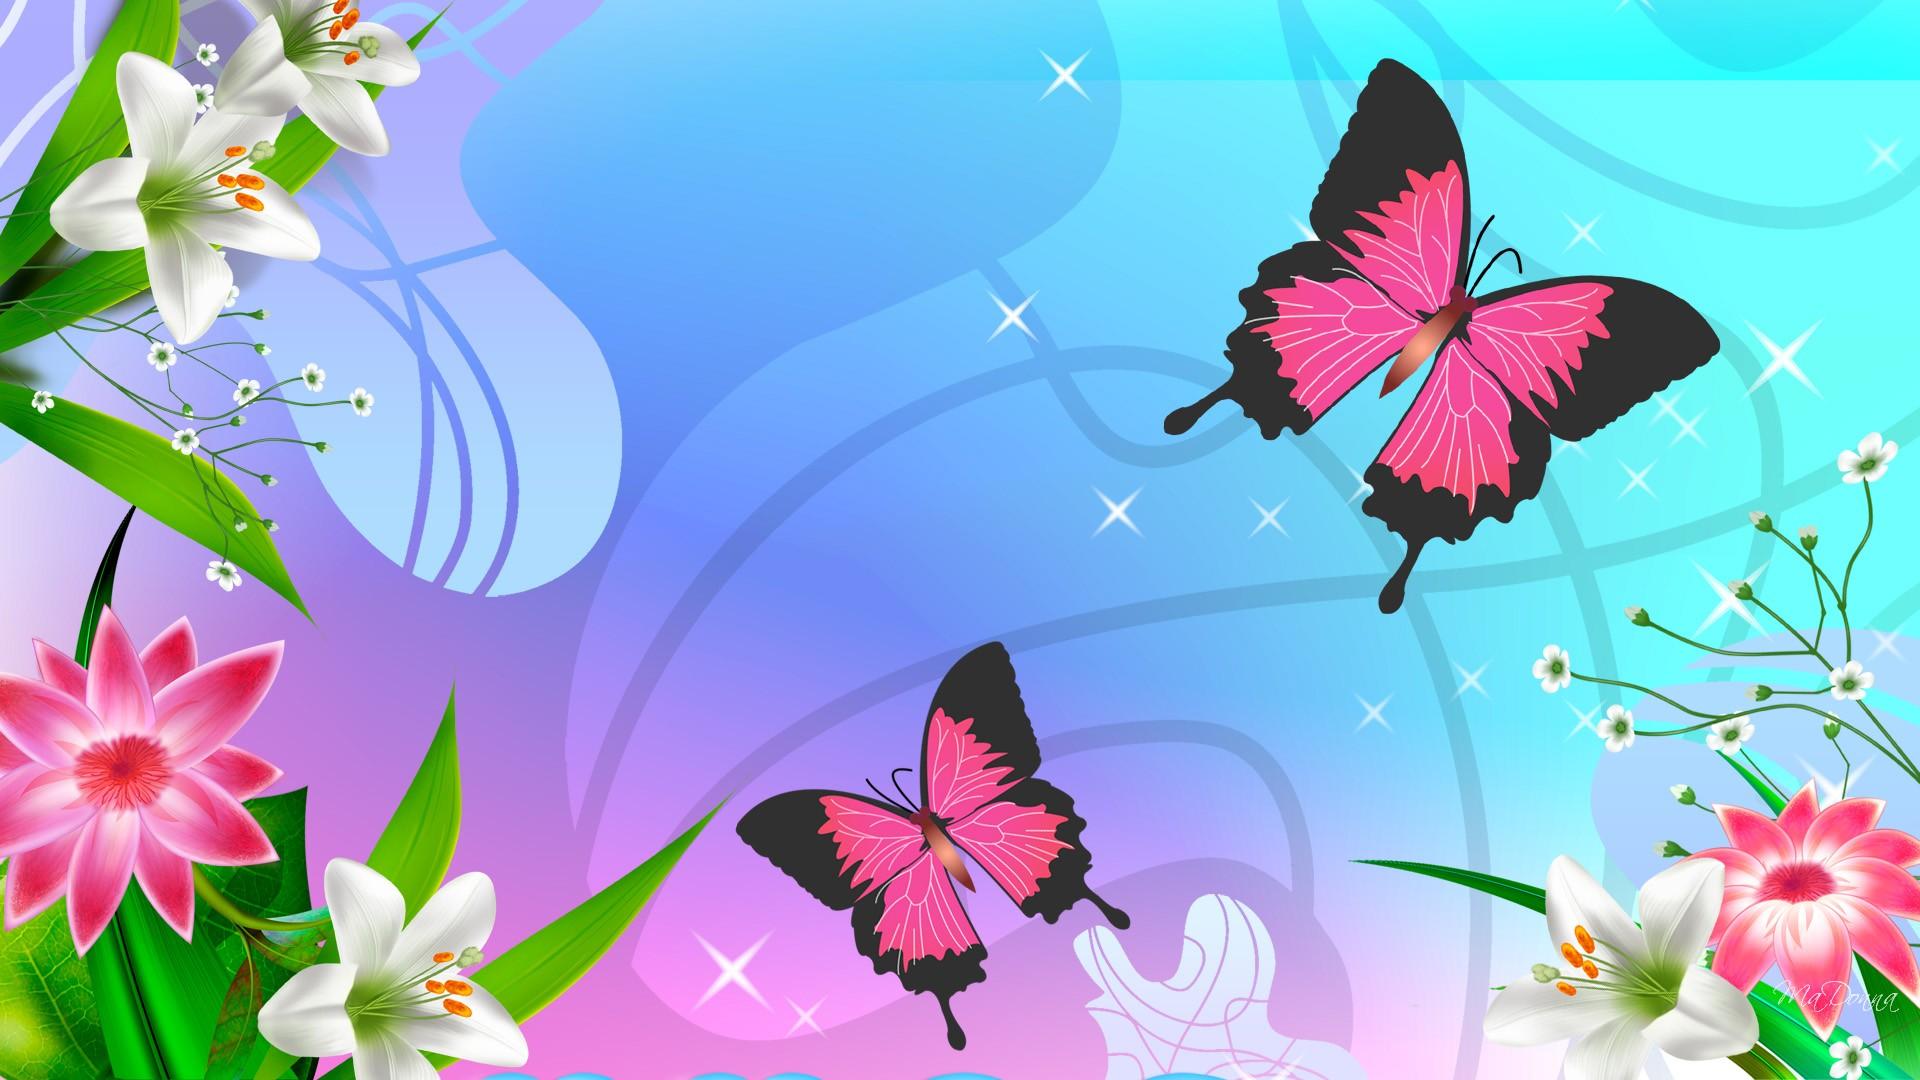 Pink Butterfly Wallpaper Desktop WallpaperSafari - Butterfly wallpaper for computer desktop